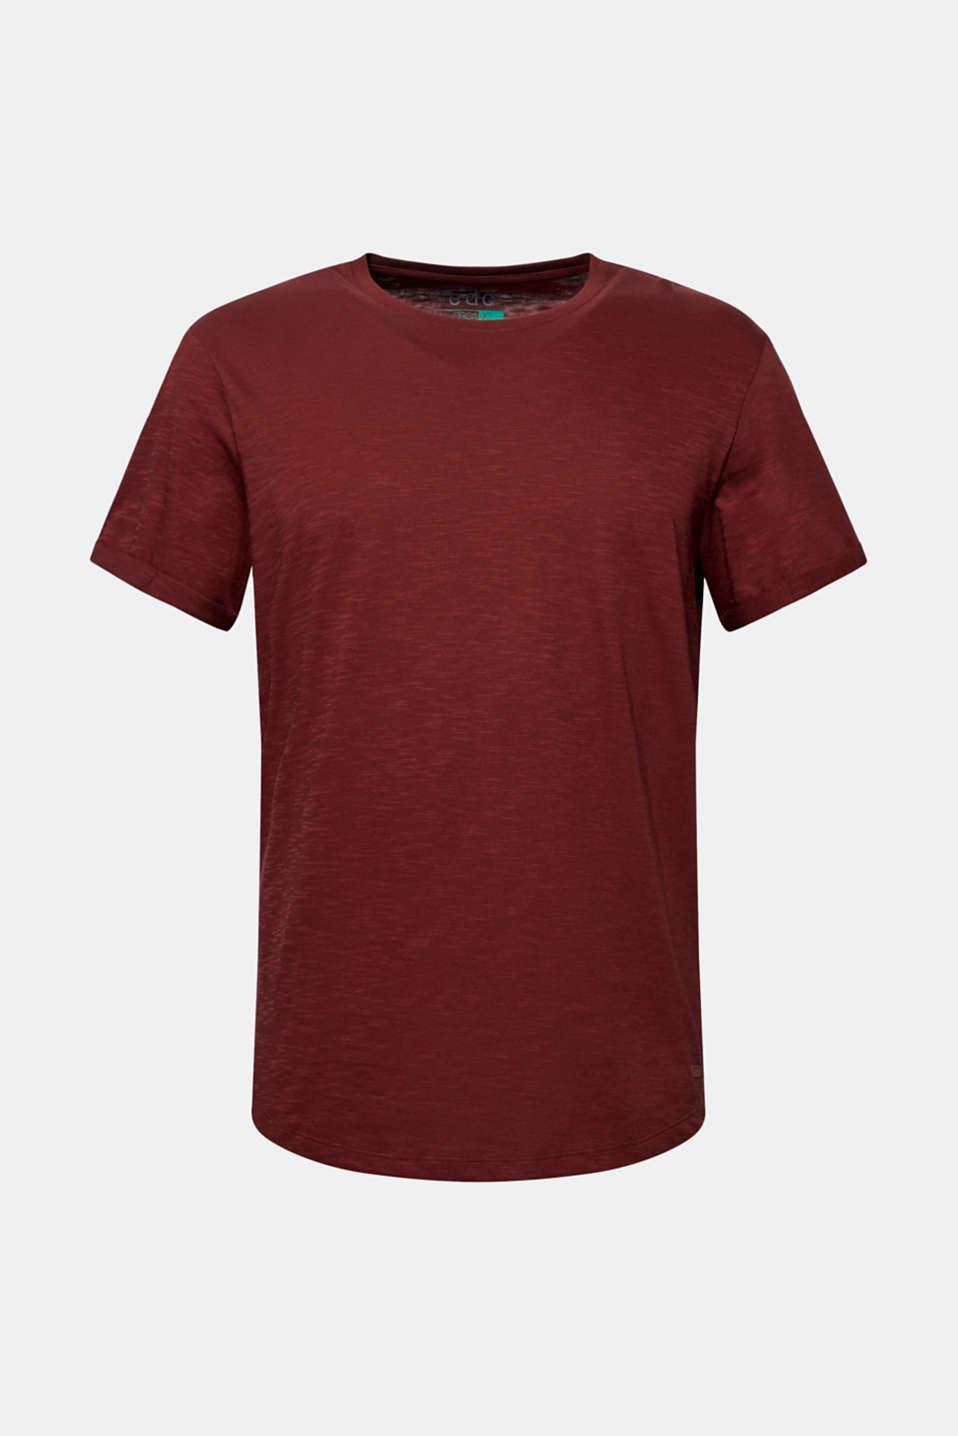 Slub jersey T-shirt in 100% cotton, TERRACOTTA, detail image number 5